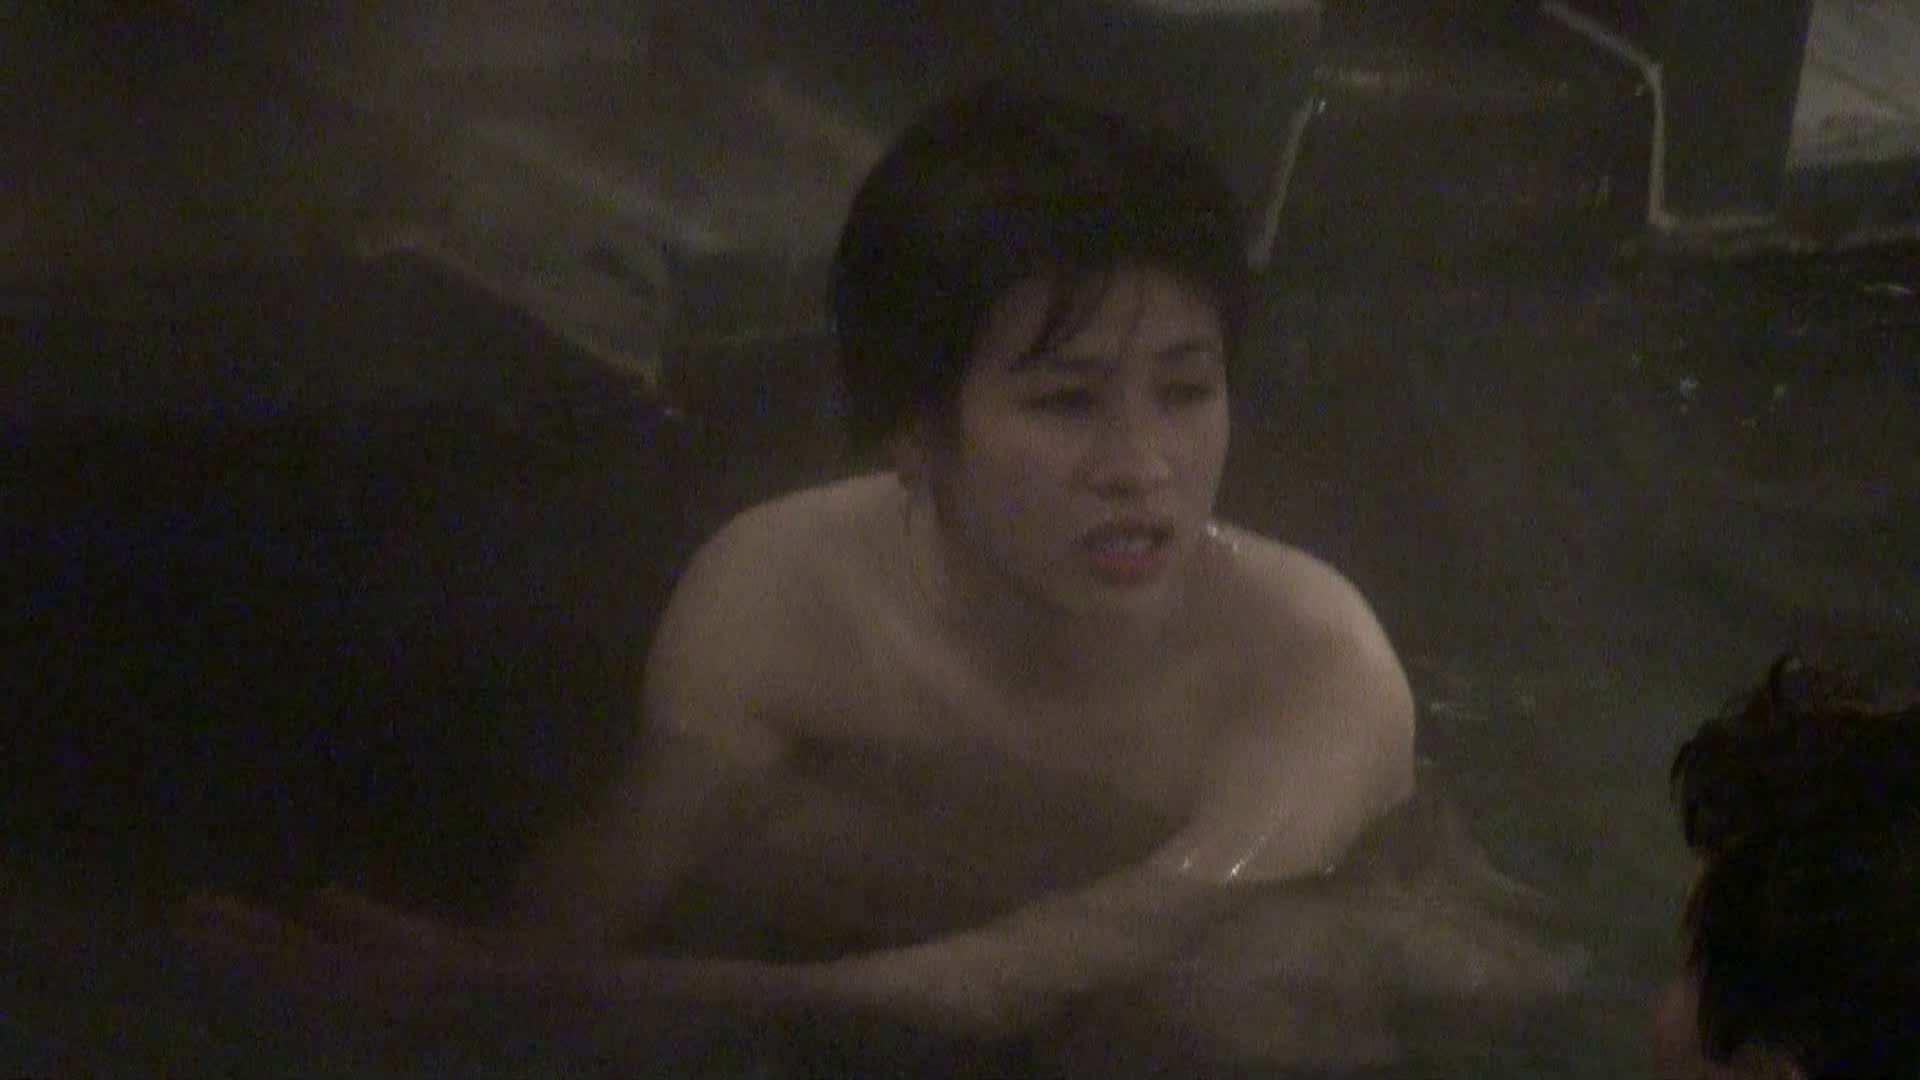 Aquaな露天風呂Vol.438 0 | 0  65連発 61